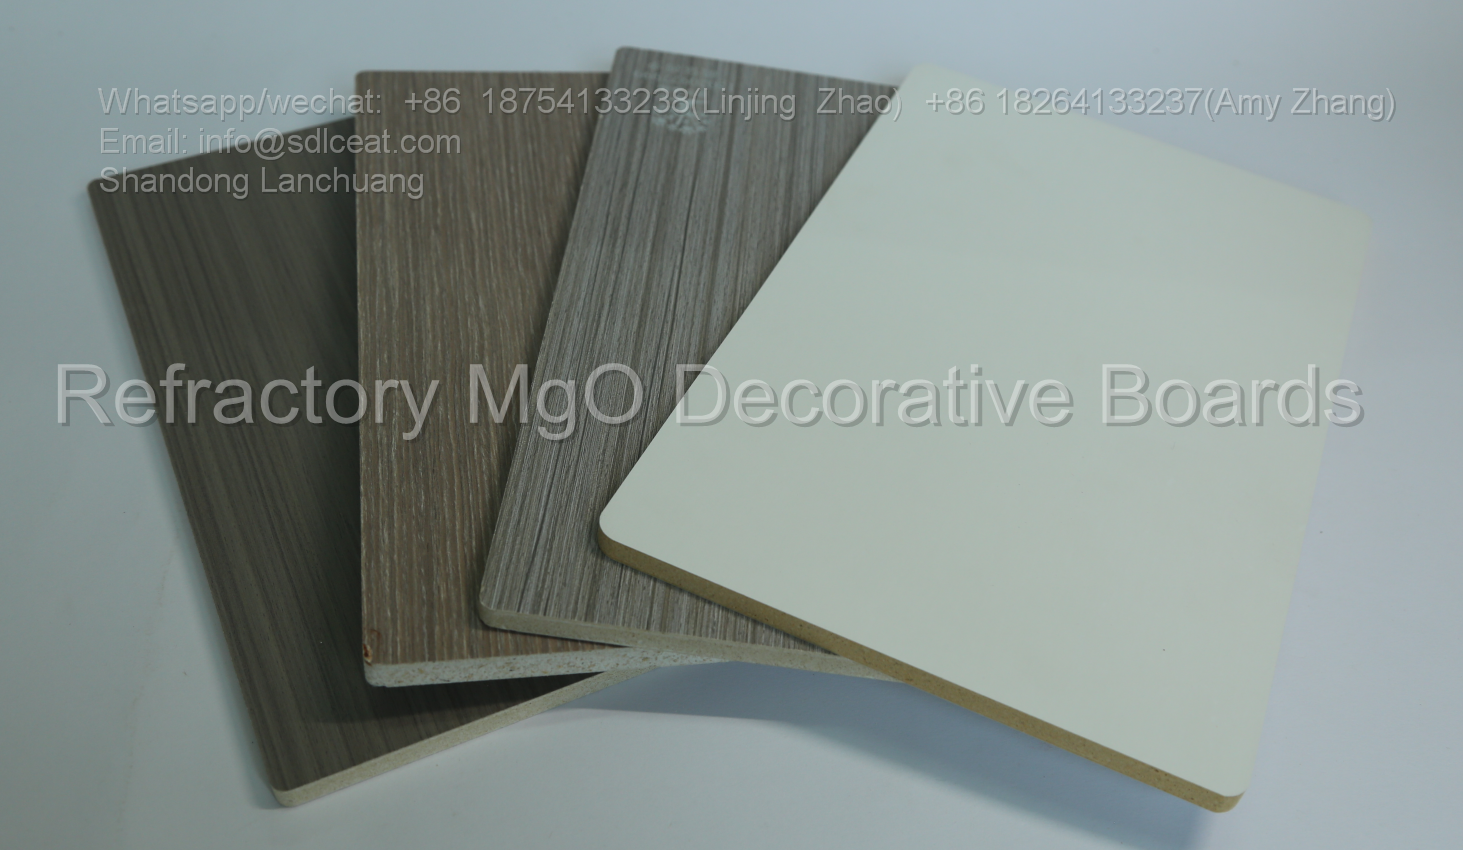 decorative mgo board,magnesium decorative panels